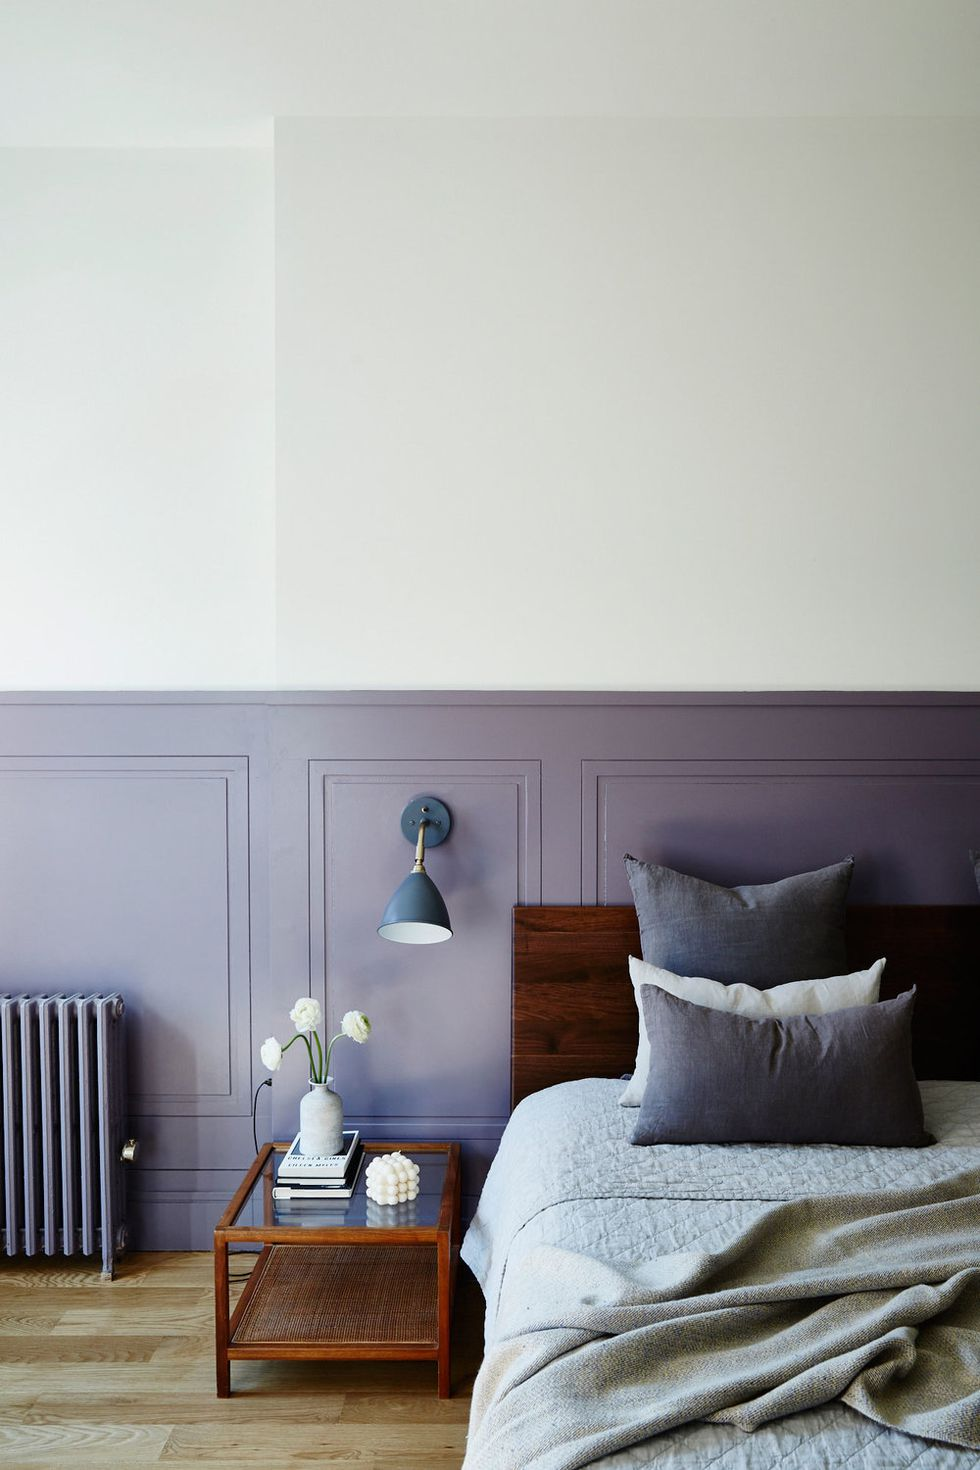 5 Feng ShuiBedroom Ideas 5 Feng Shui Bedroom Ideas To A Better Sleeping Time! 5 Feng Shui Bedroom Ideas To A Better Sleeping Time 2